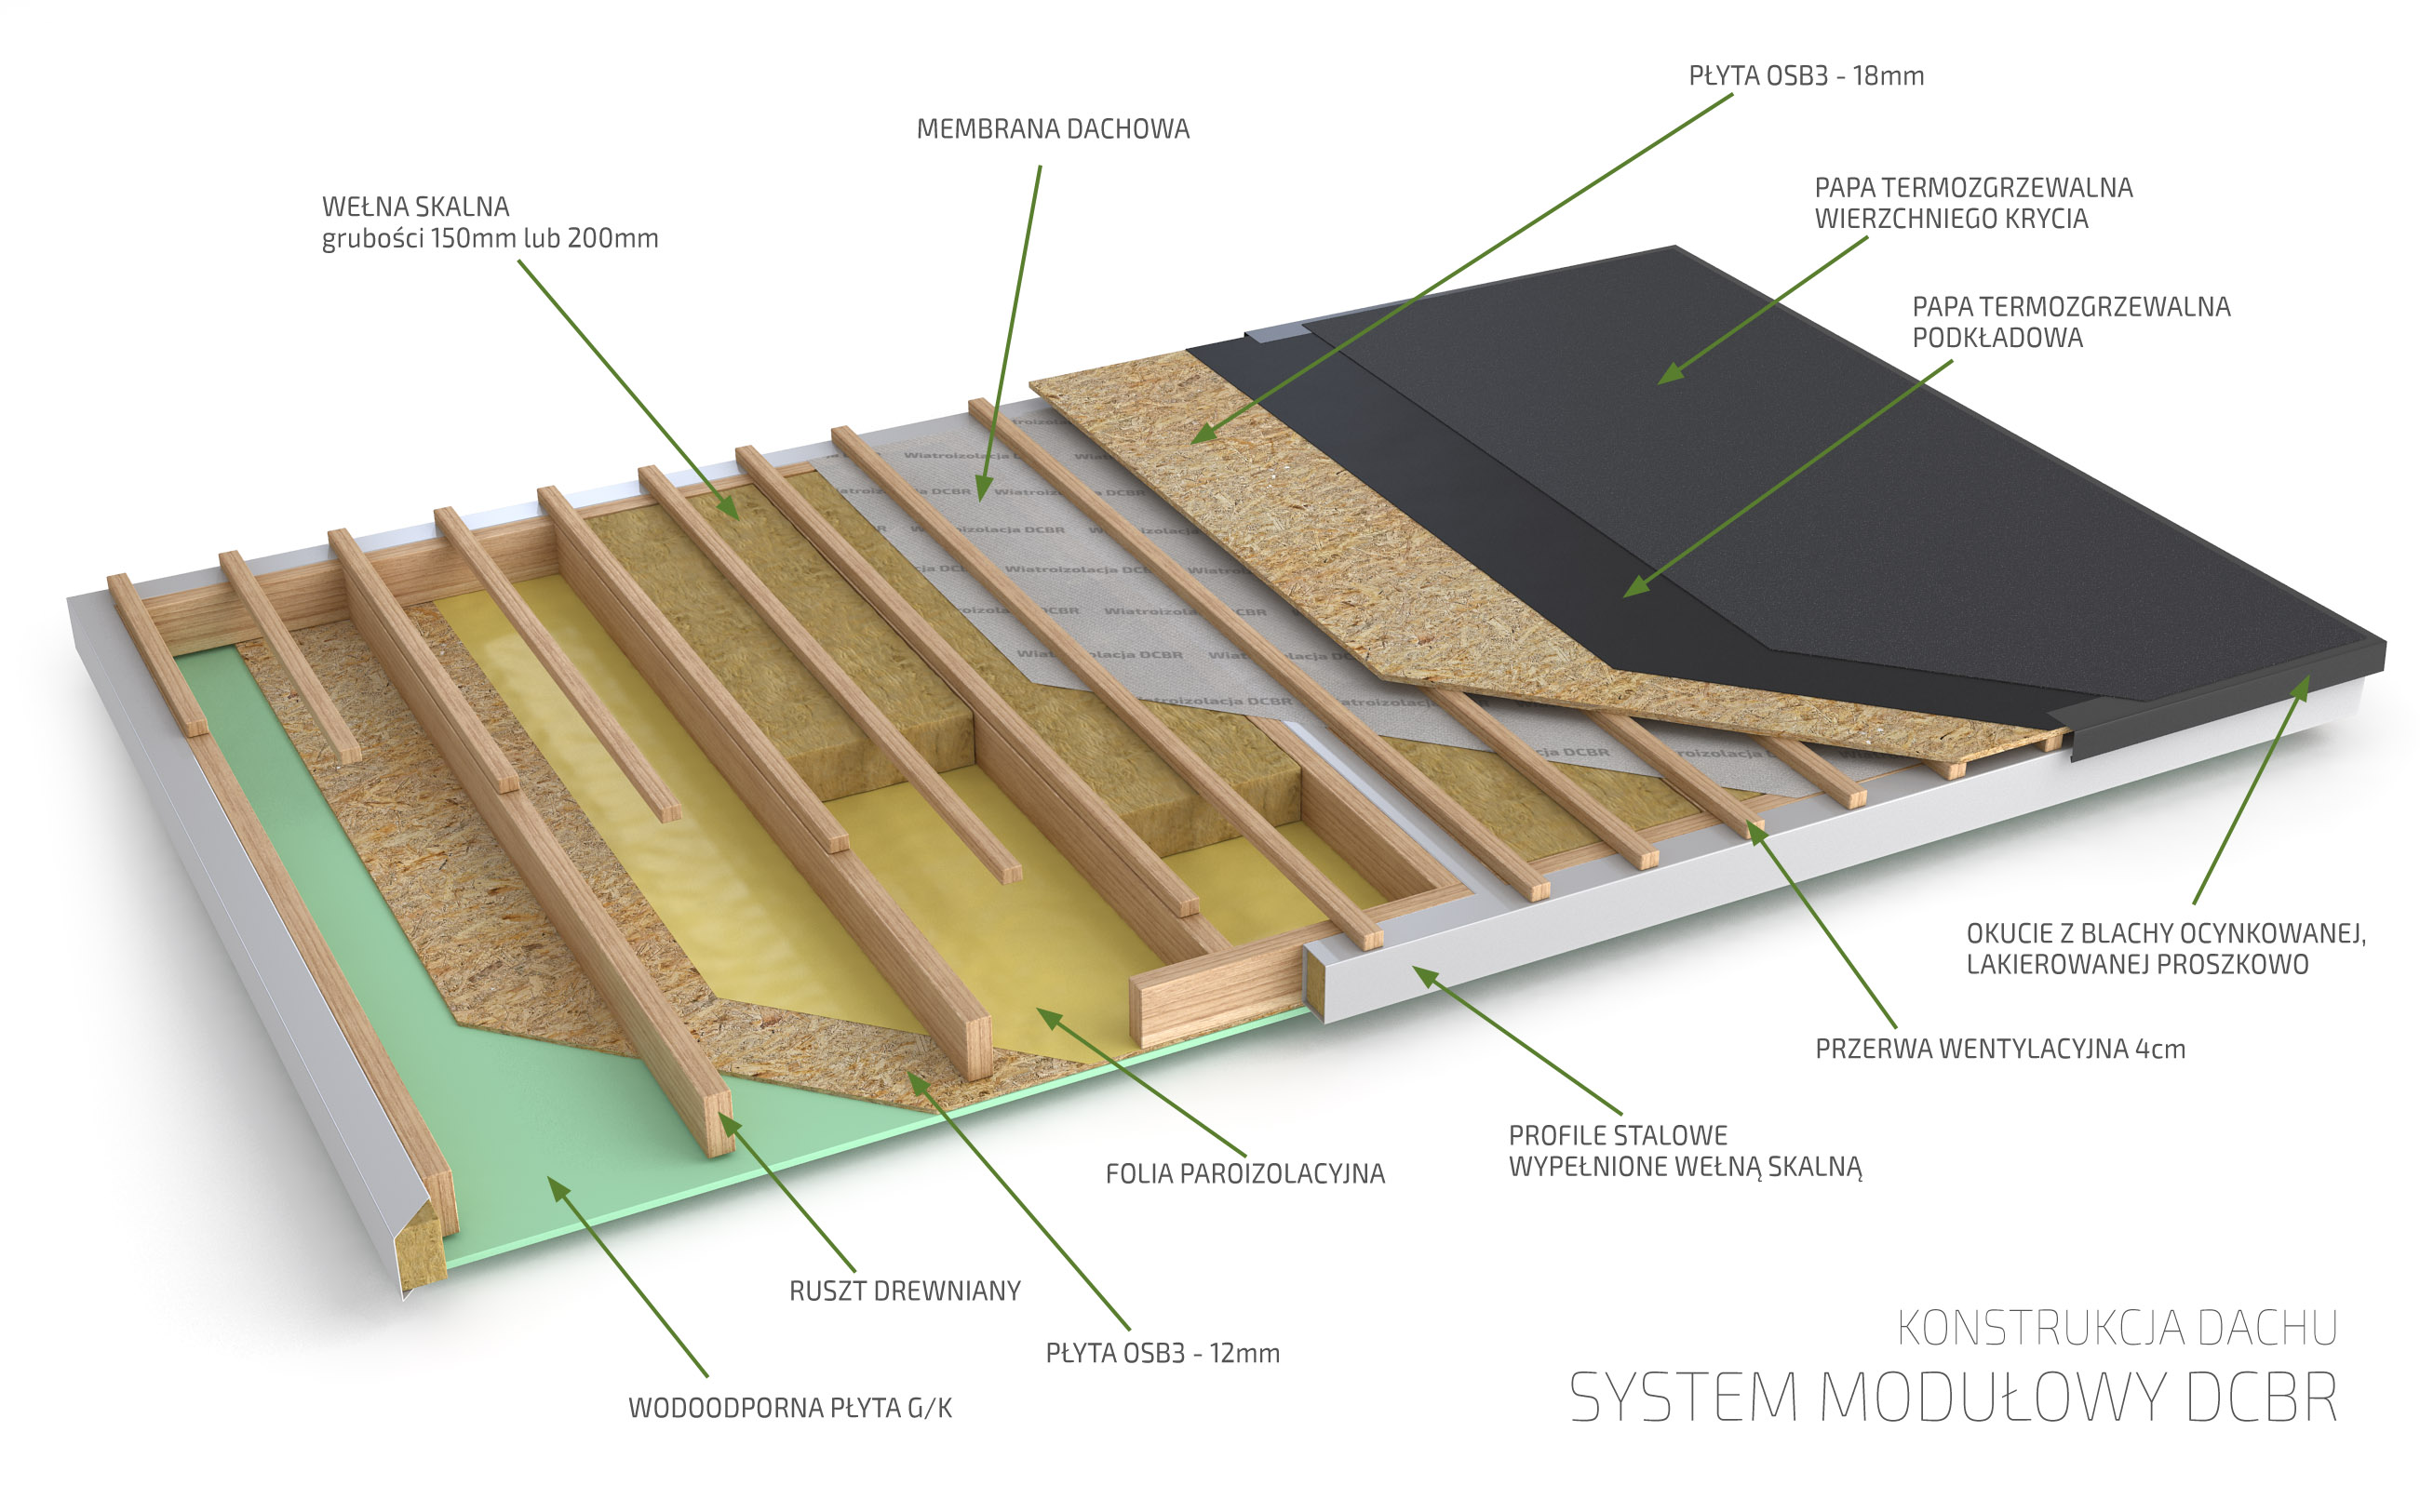 Konstrukcja dachu DCBR